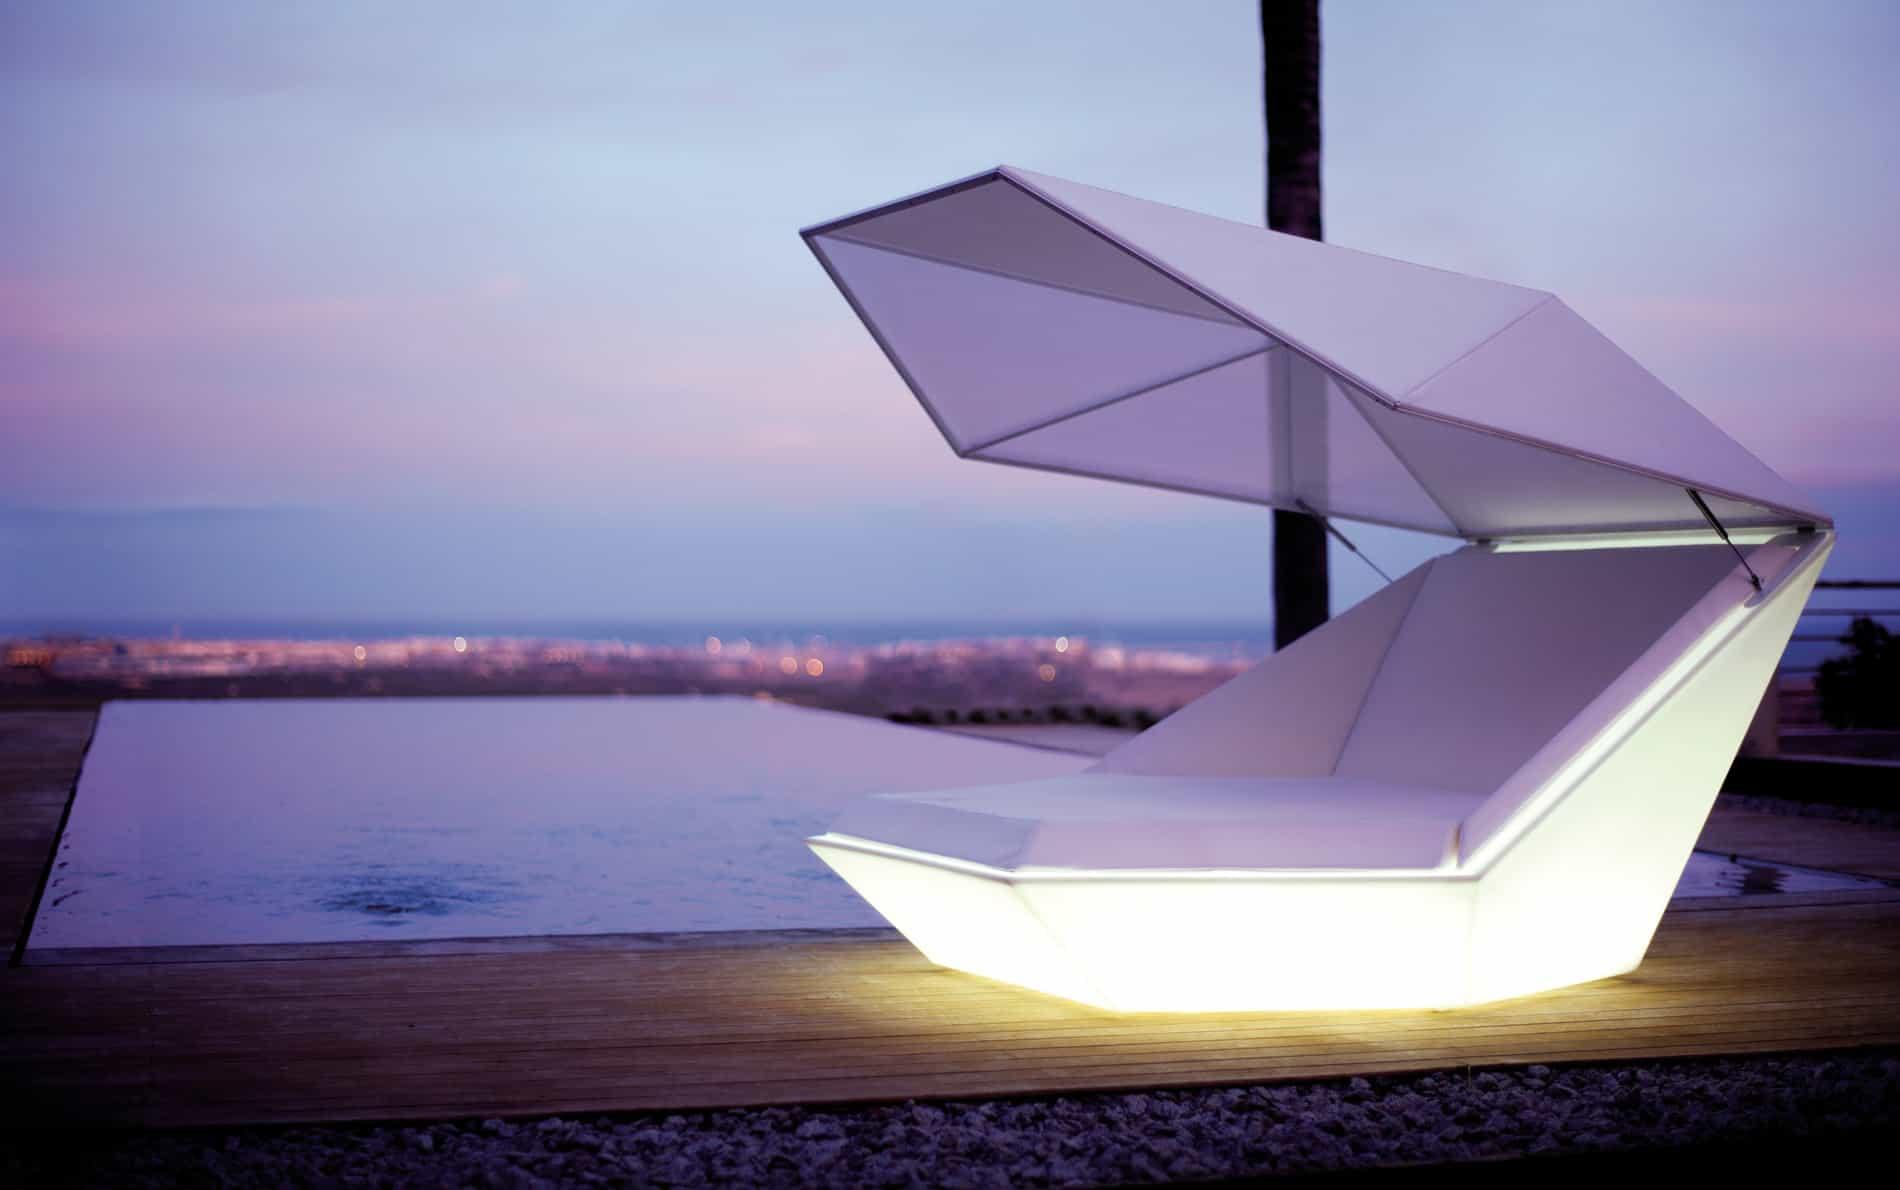 sonnenliege g nstig kaufen. Black Bedroom Furniture Sets. Home Design Ideas